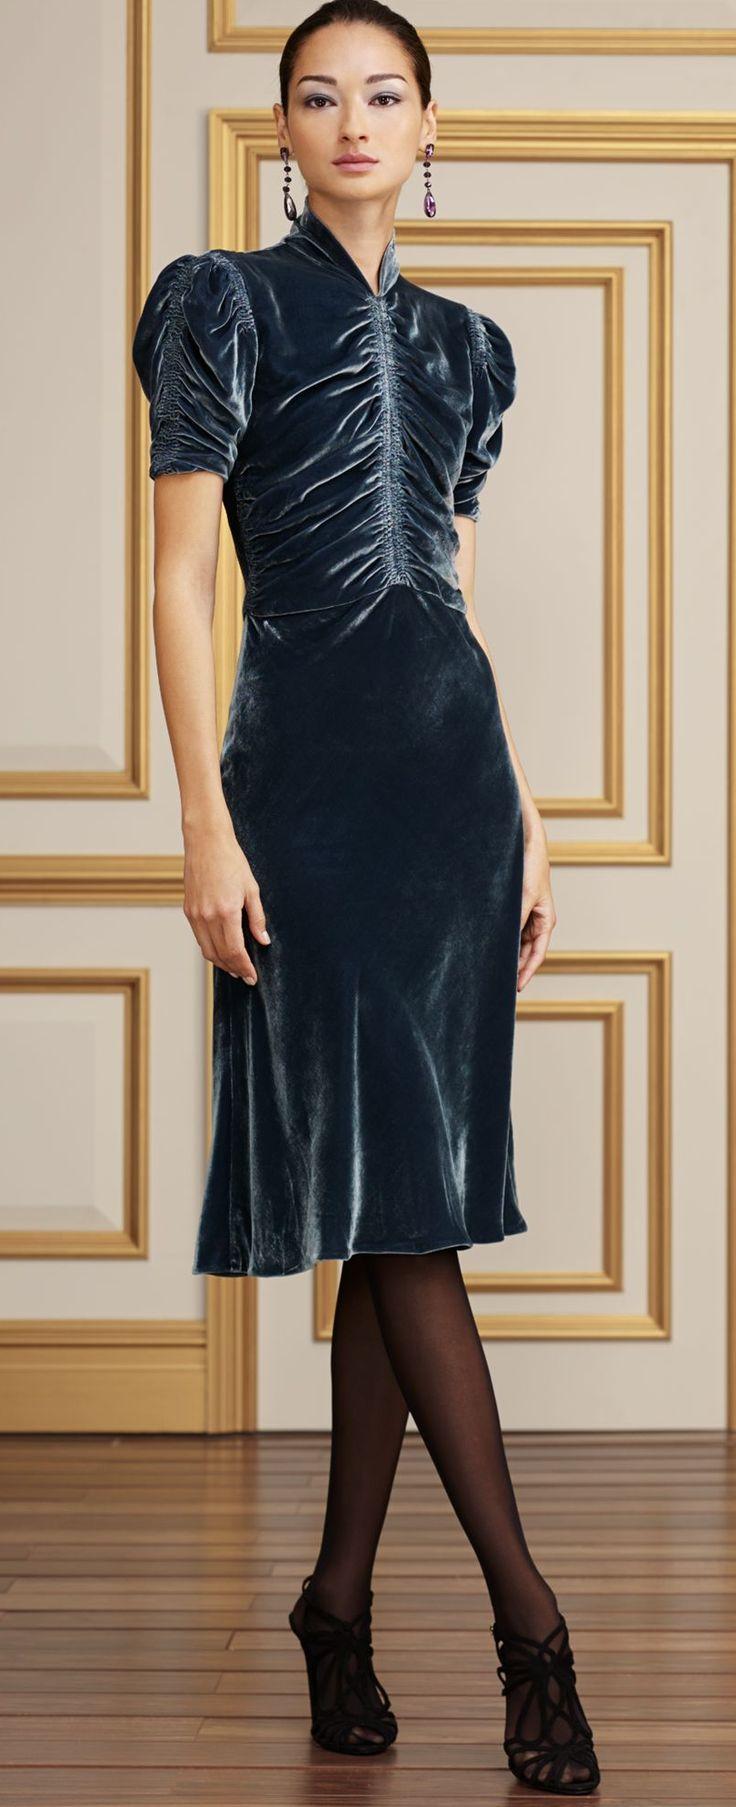 I like the dress, tights, & heels, but I would want stud earrings instead